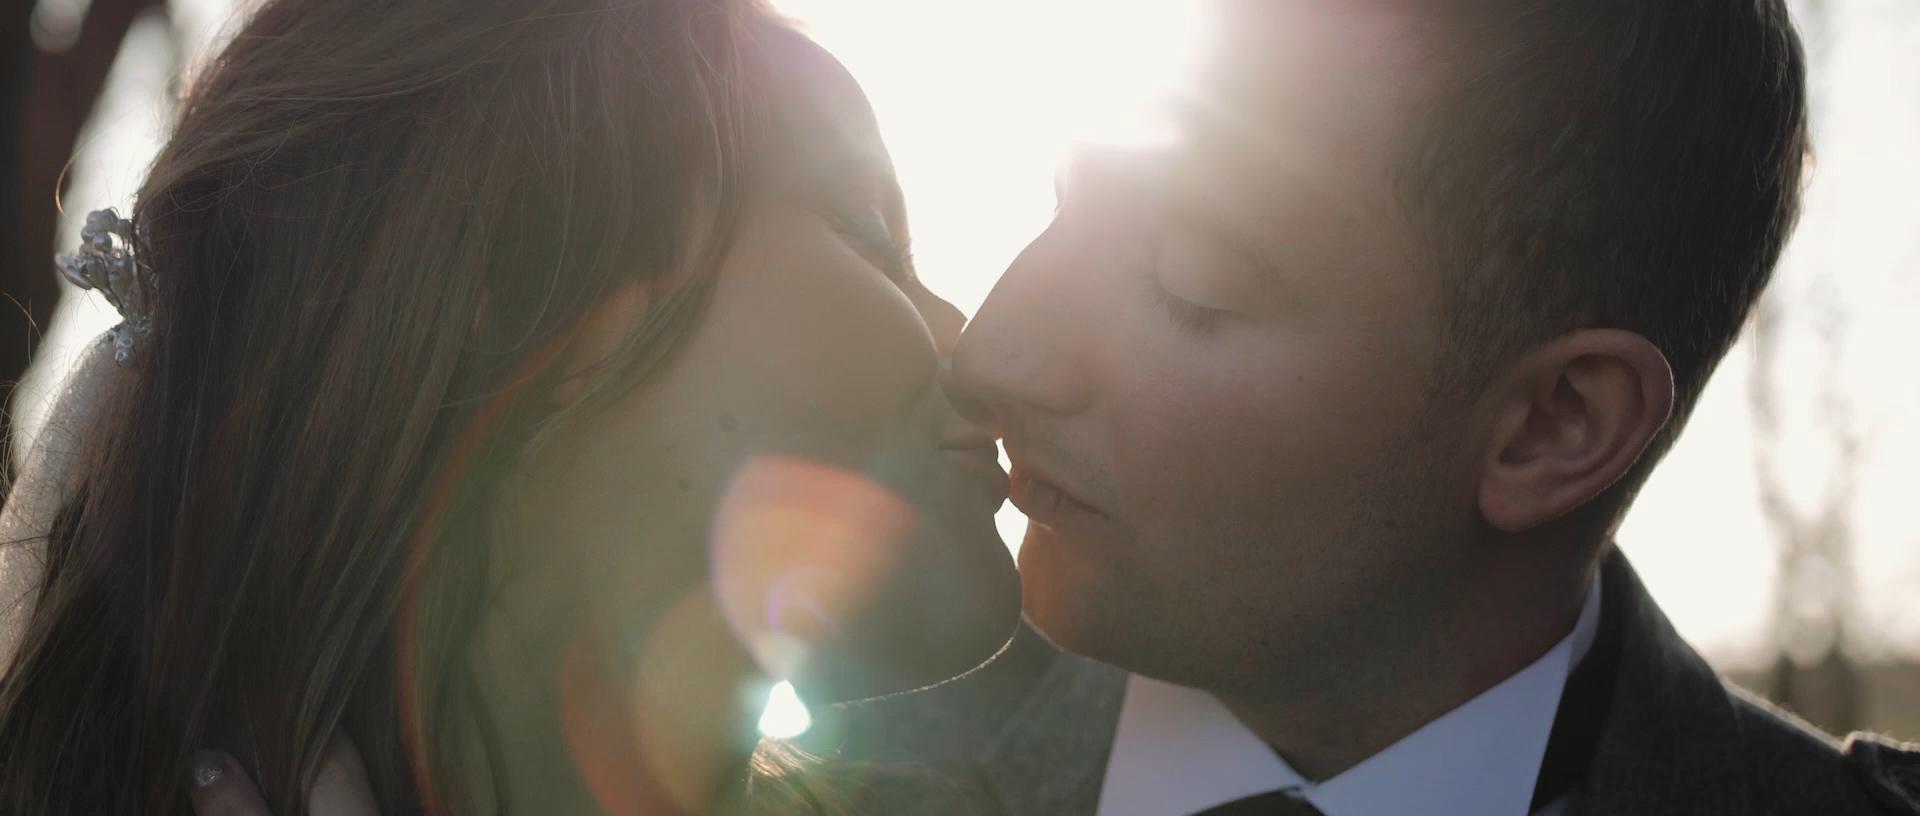 forgans-wedding-videographer_LL_03.jpg